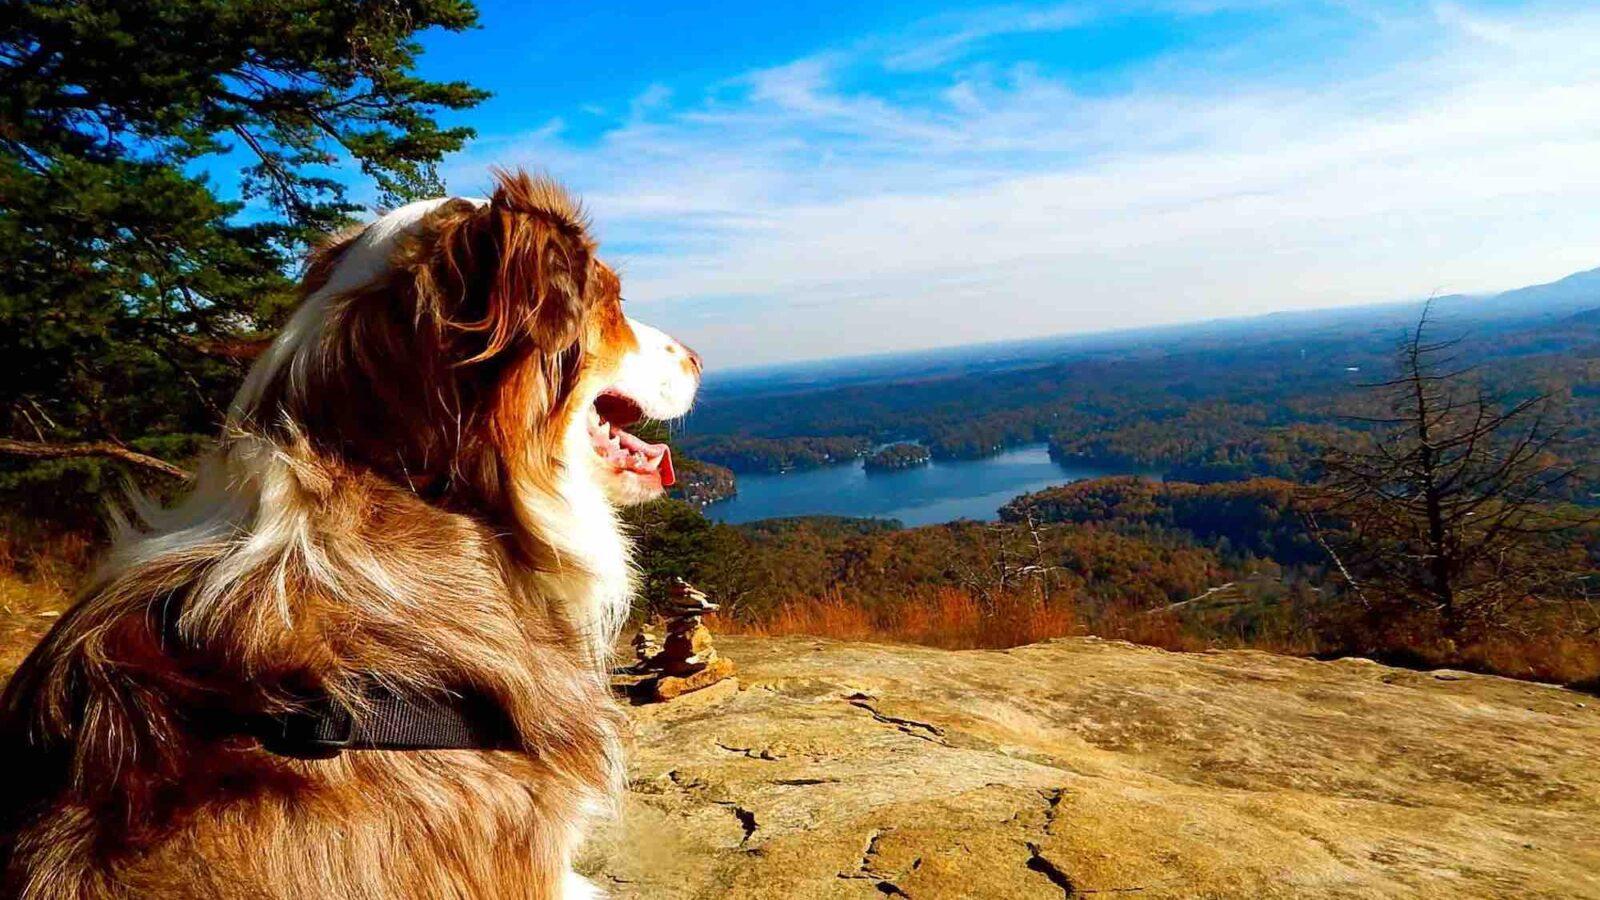 Contact Dog Gone Real - Australian Shepherd Hiking